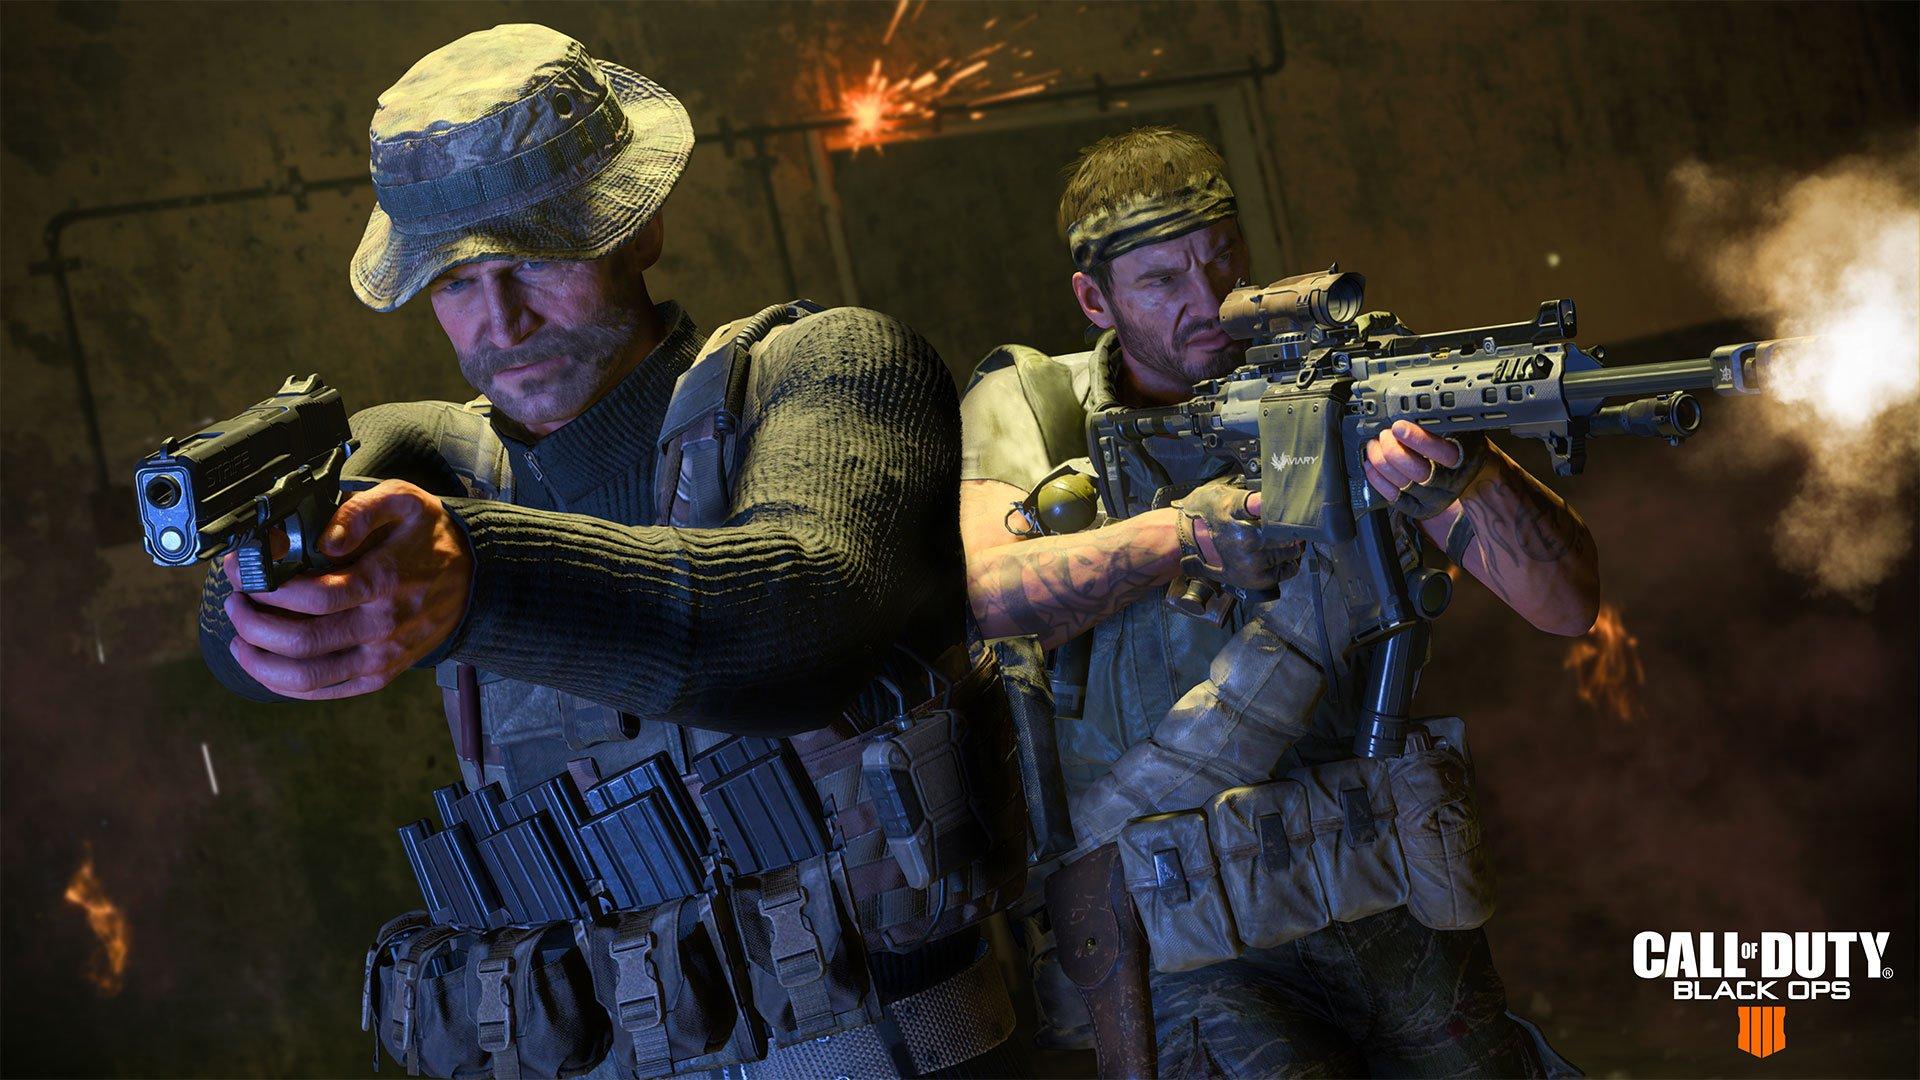 3DM早报 EPIC及STEAM免费送游戏 光环原策划发布新FPS